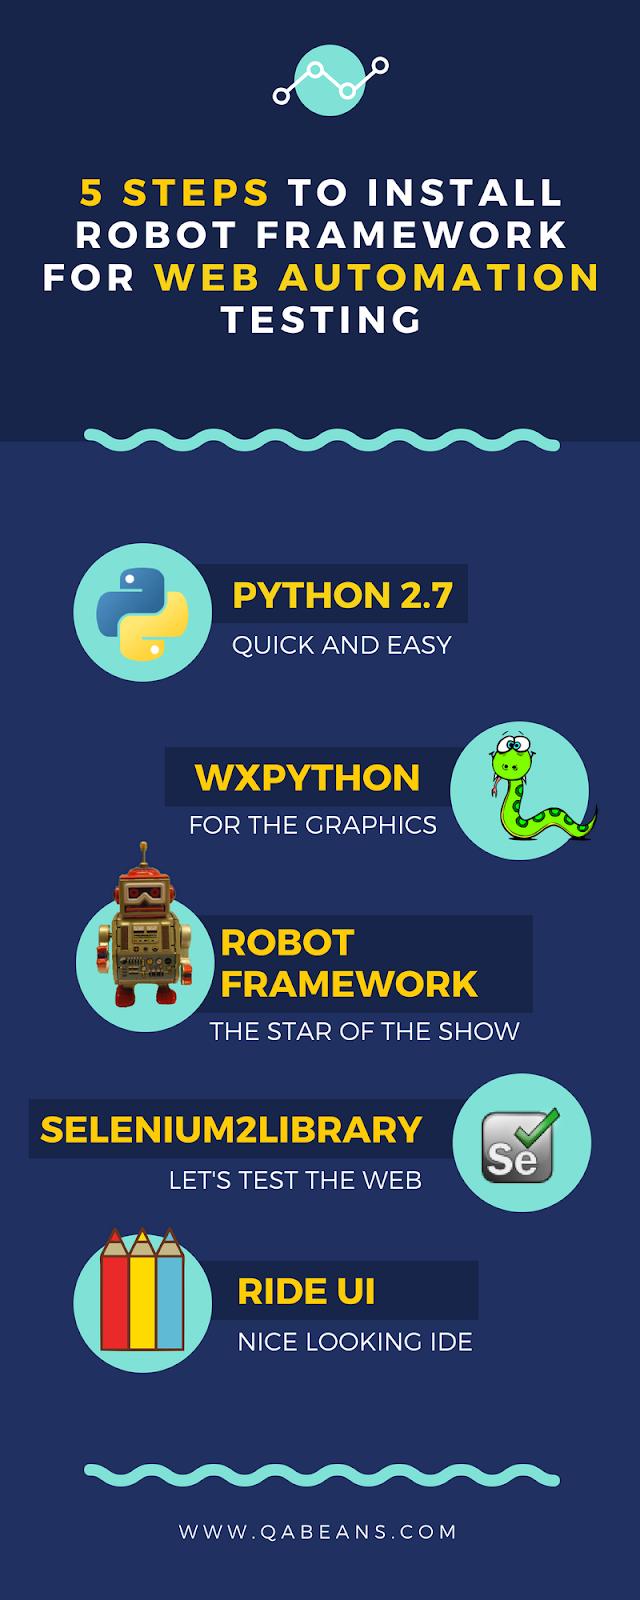 5 Steps to Install Robot Framework for Web Testing